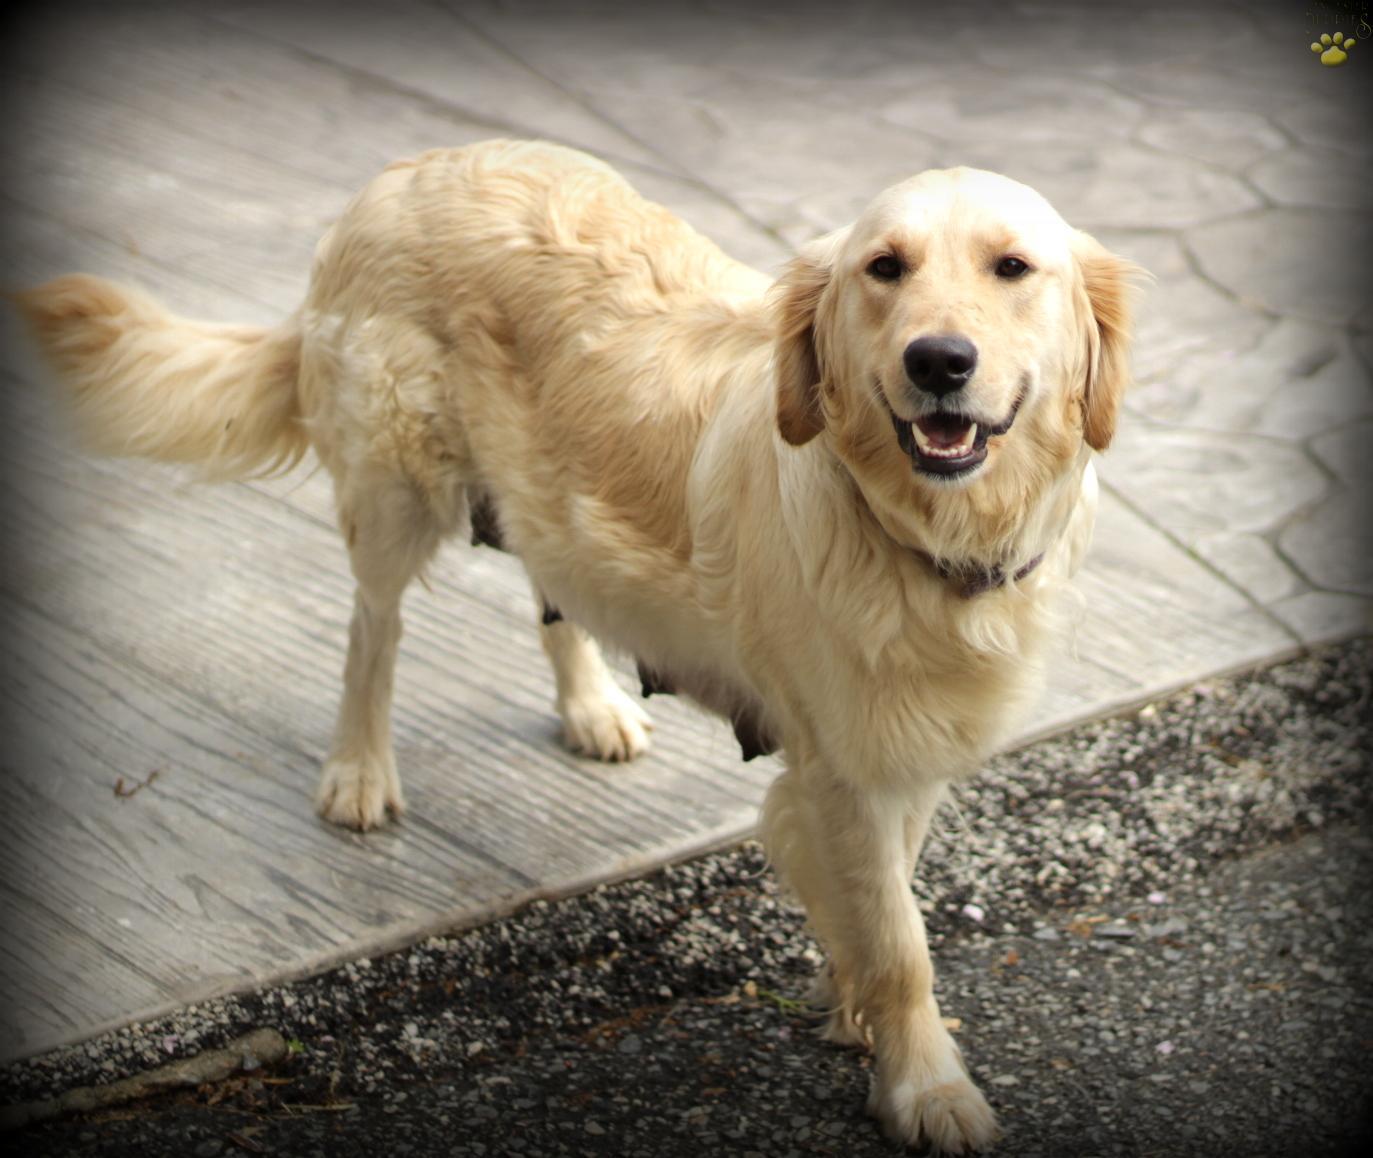 Monroe English Creamamerican Golden Retriever Puppy For Sale In